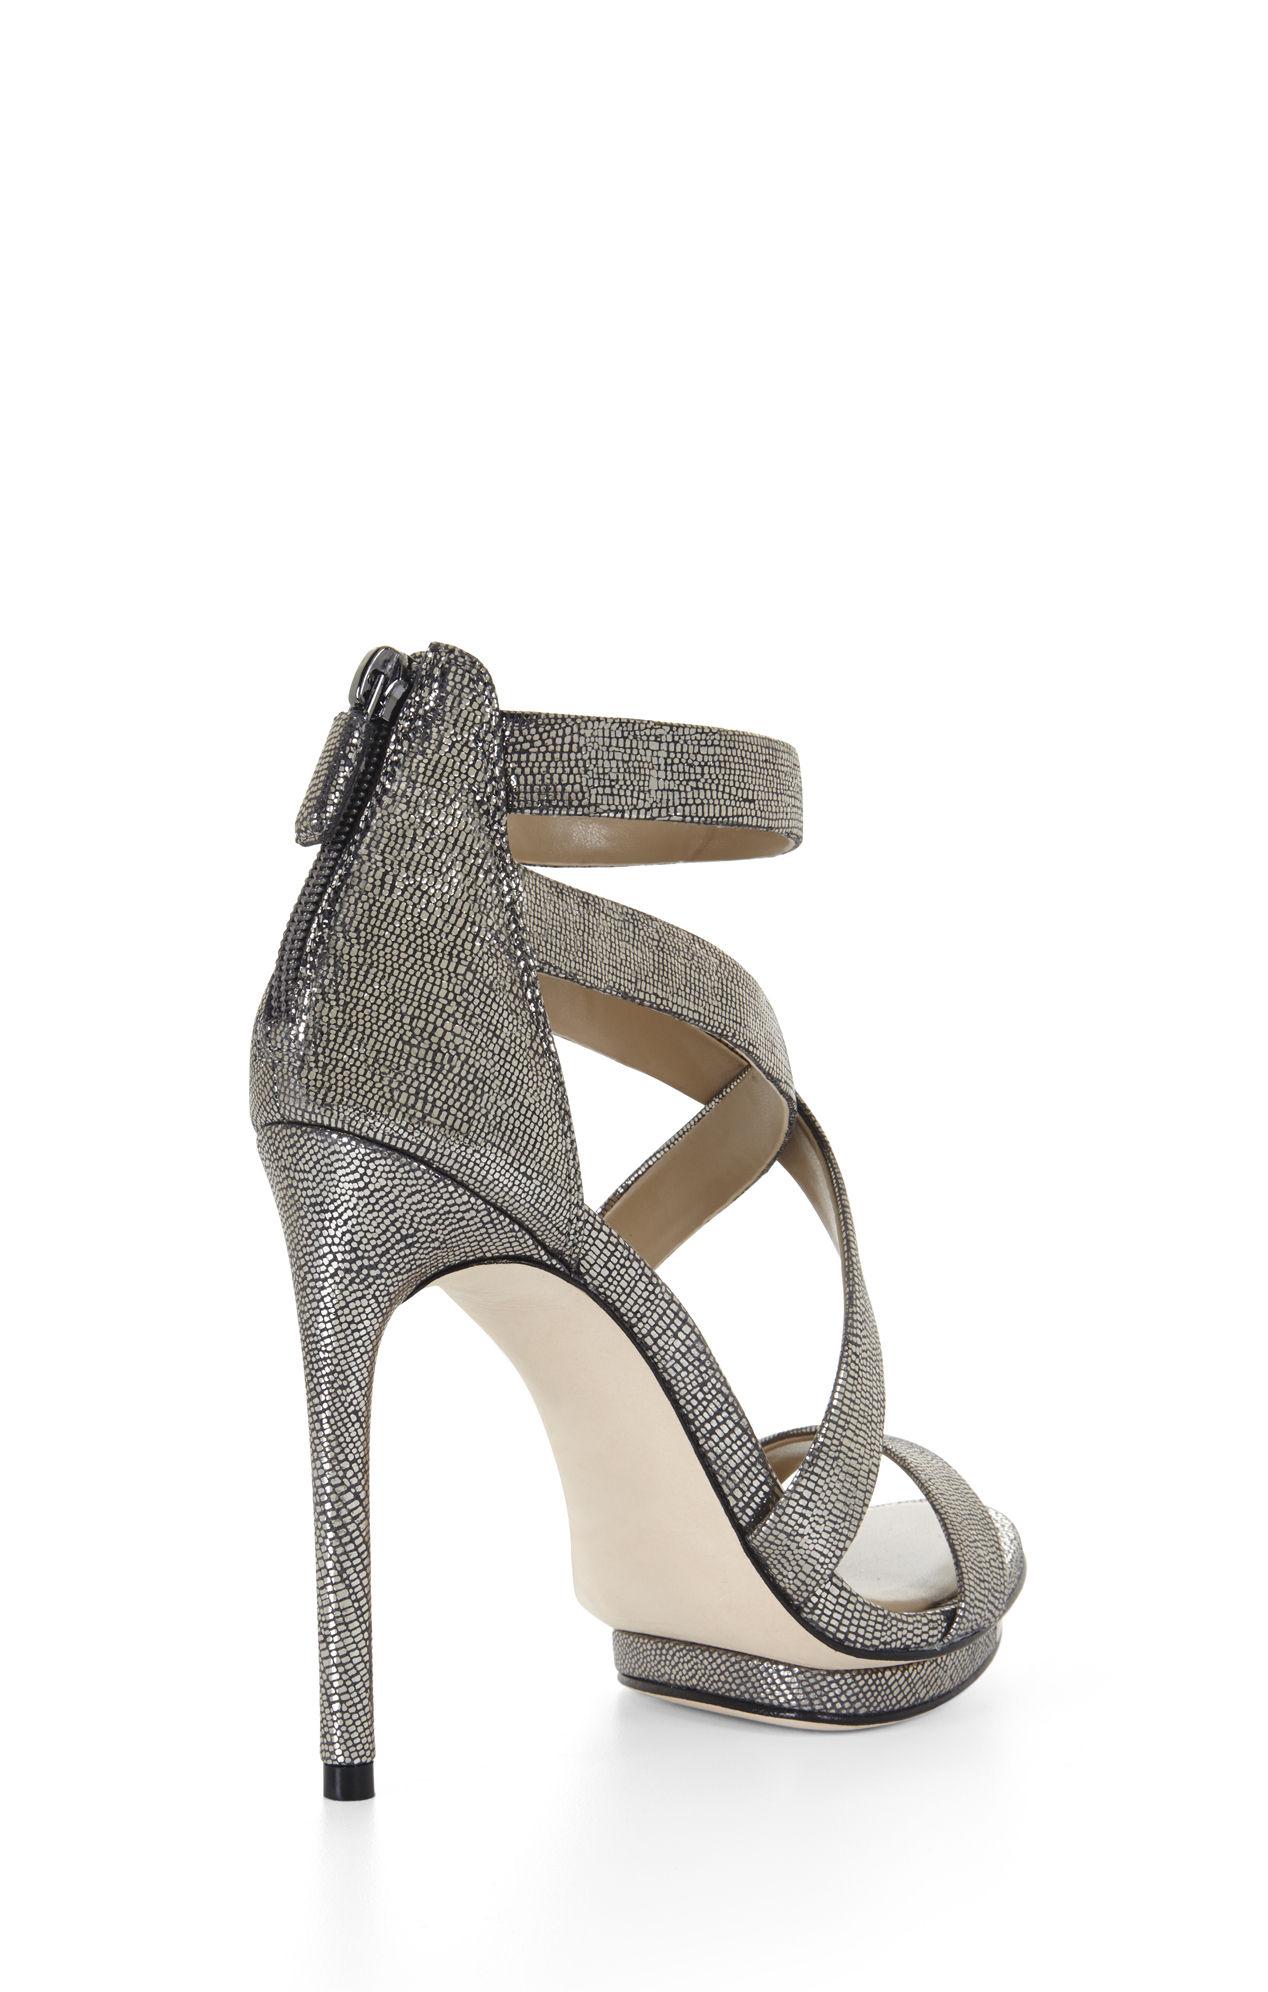 f17f9dfc0e3 Lyst - BCBGMAXAZRIA Leemour Strappy High-Heel Sandal in Gray